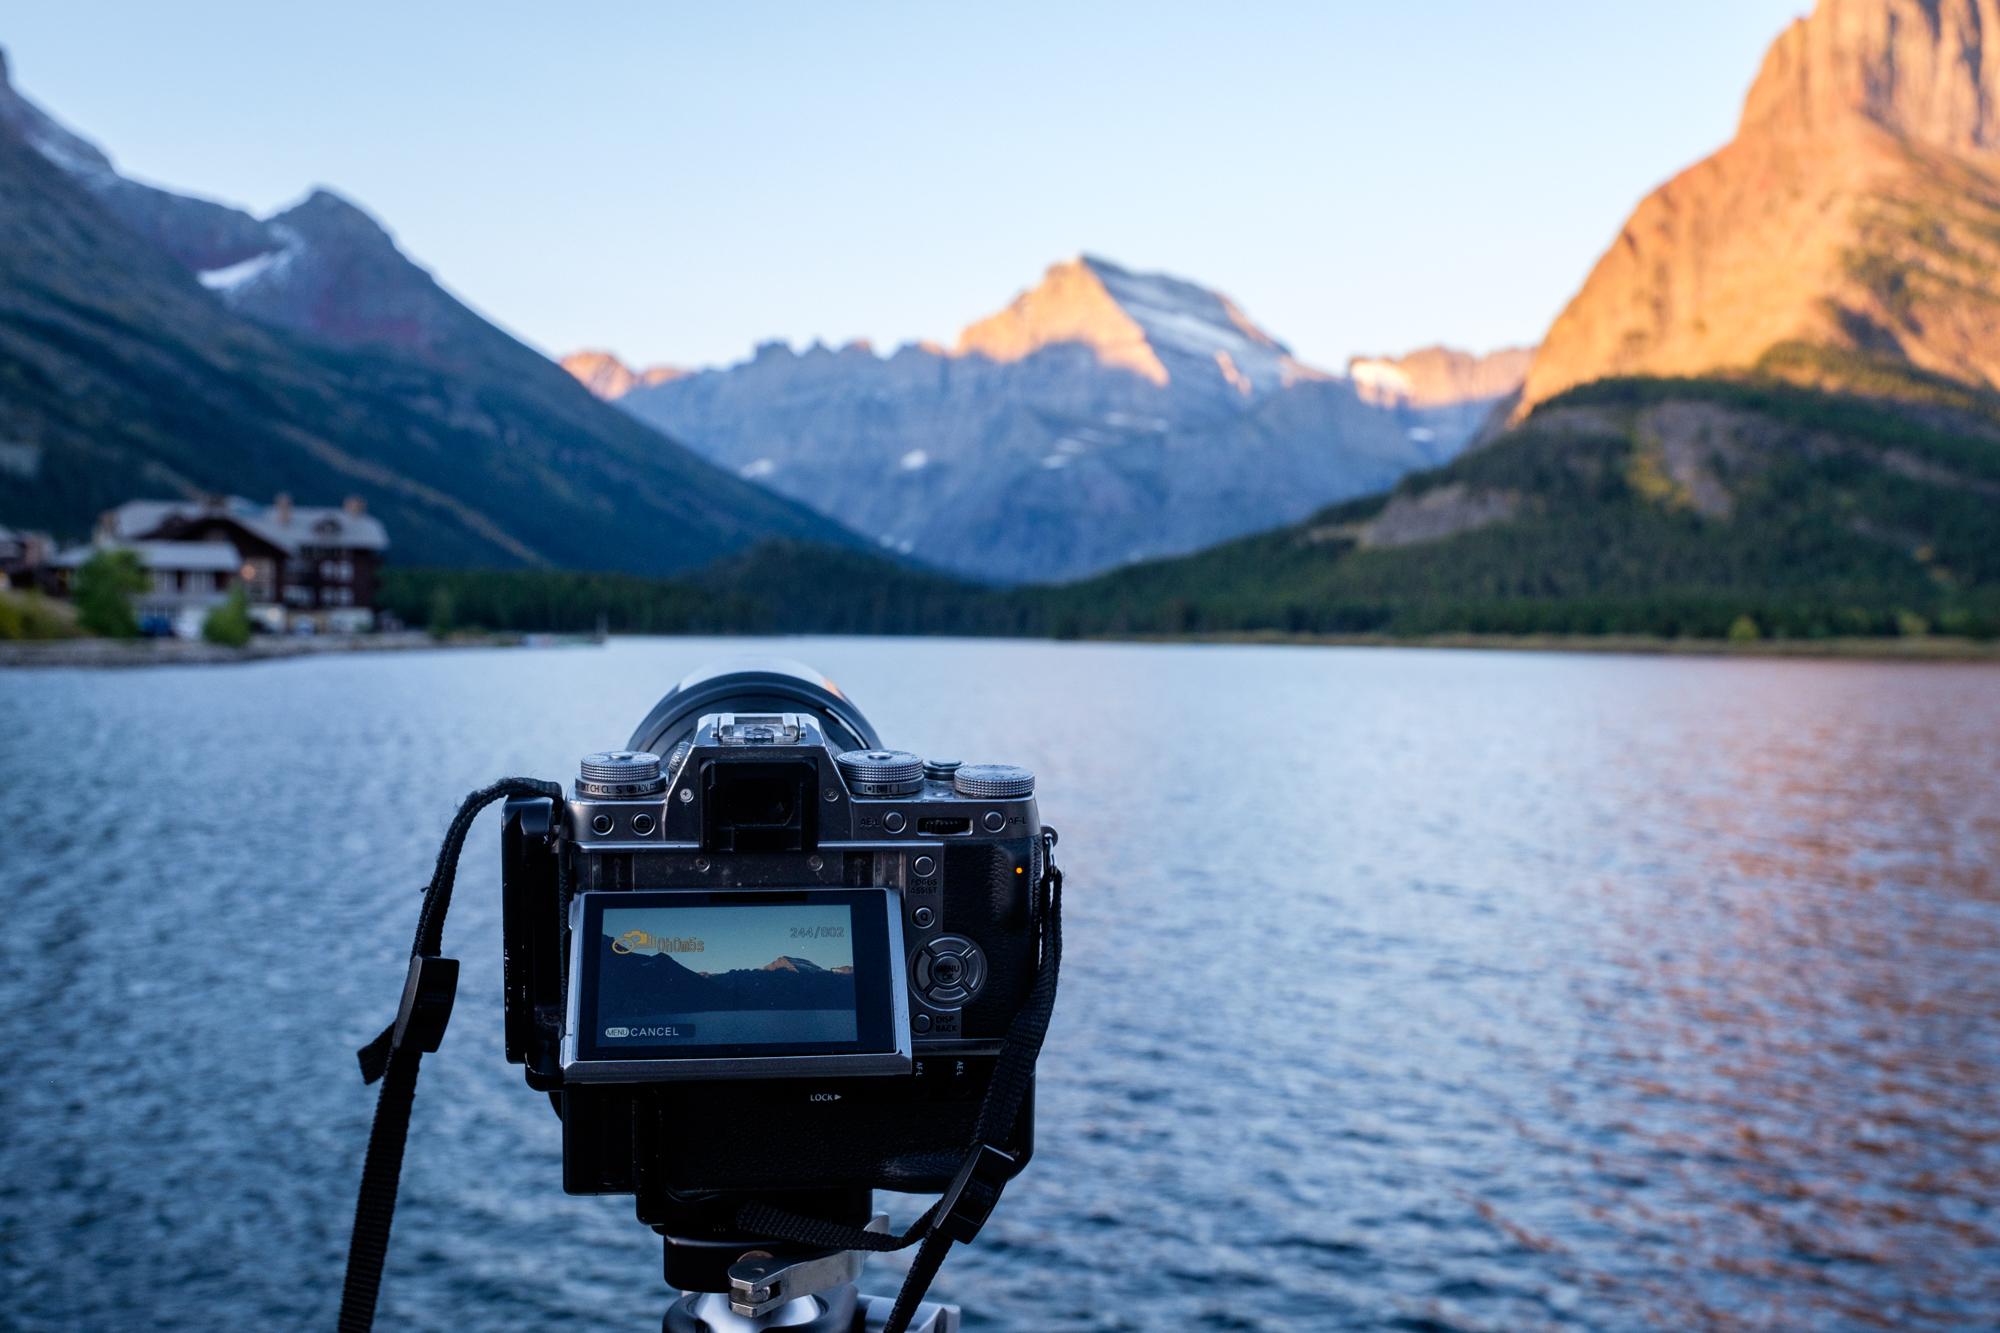 Capturing timelapse in Glacier National Park in Montana.